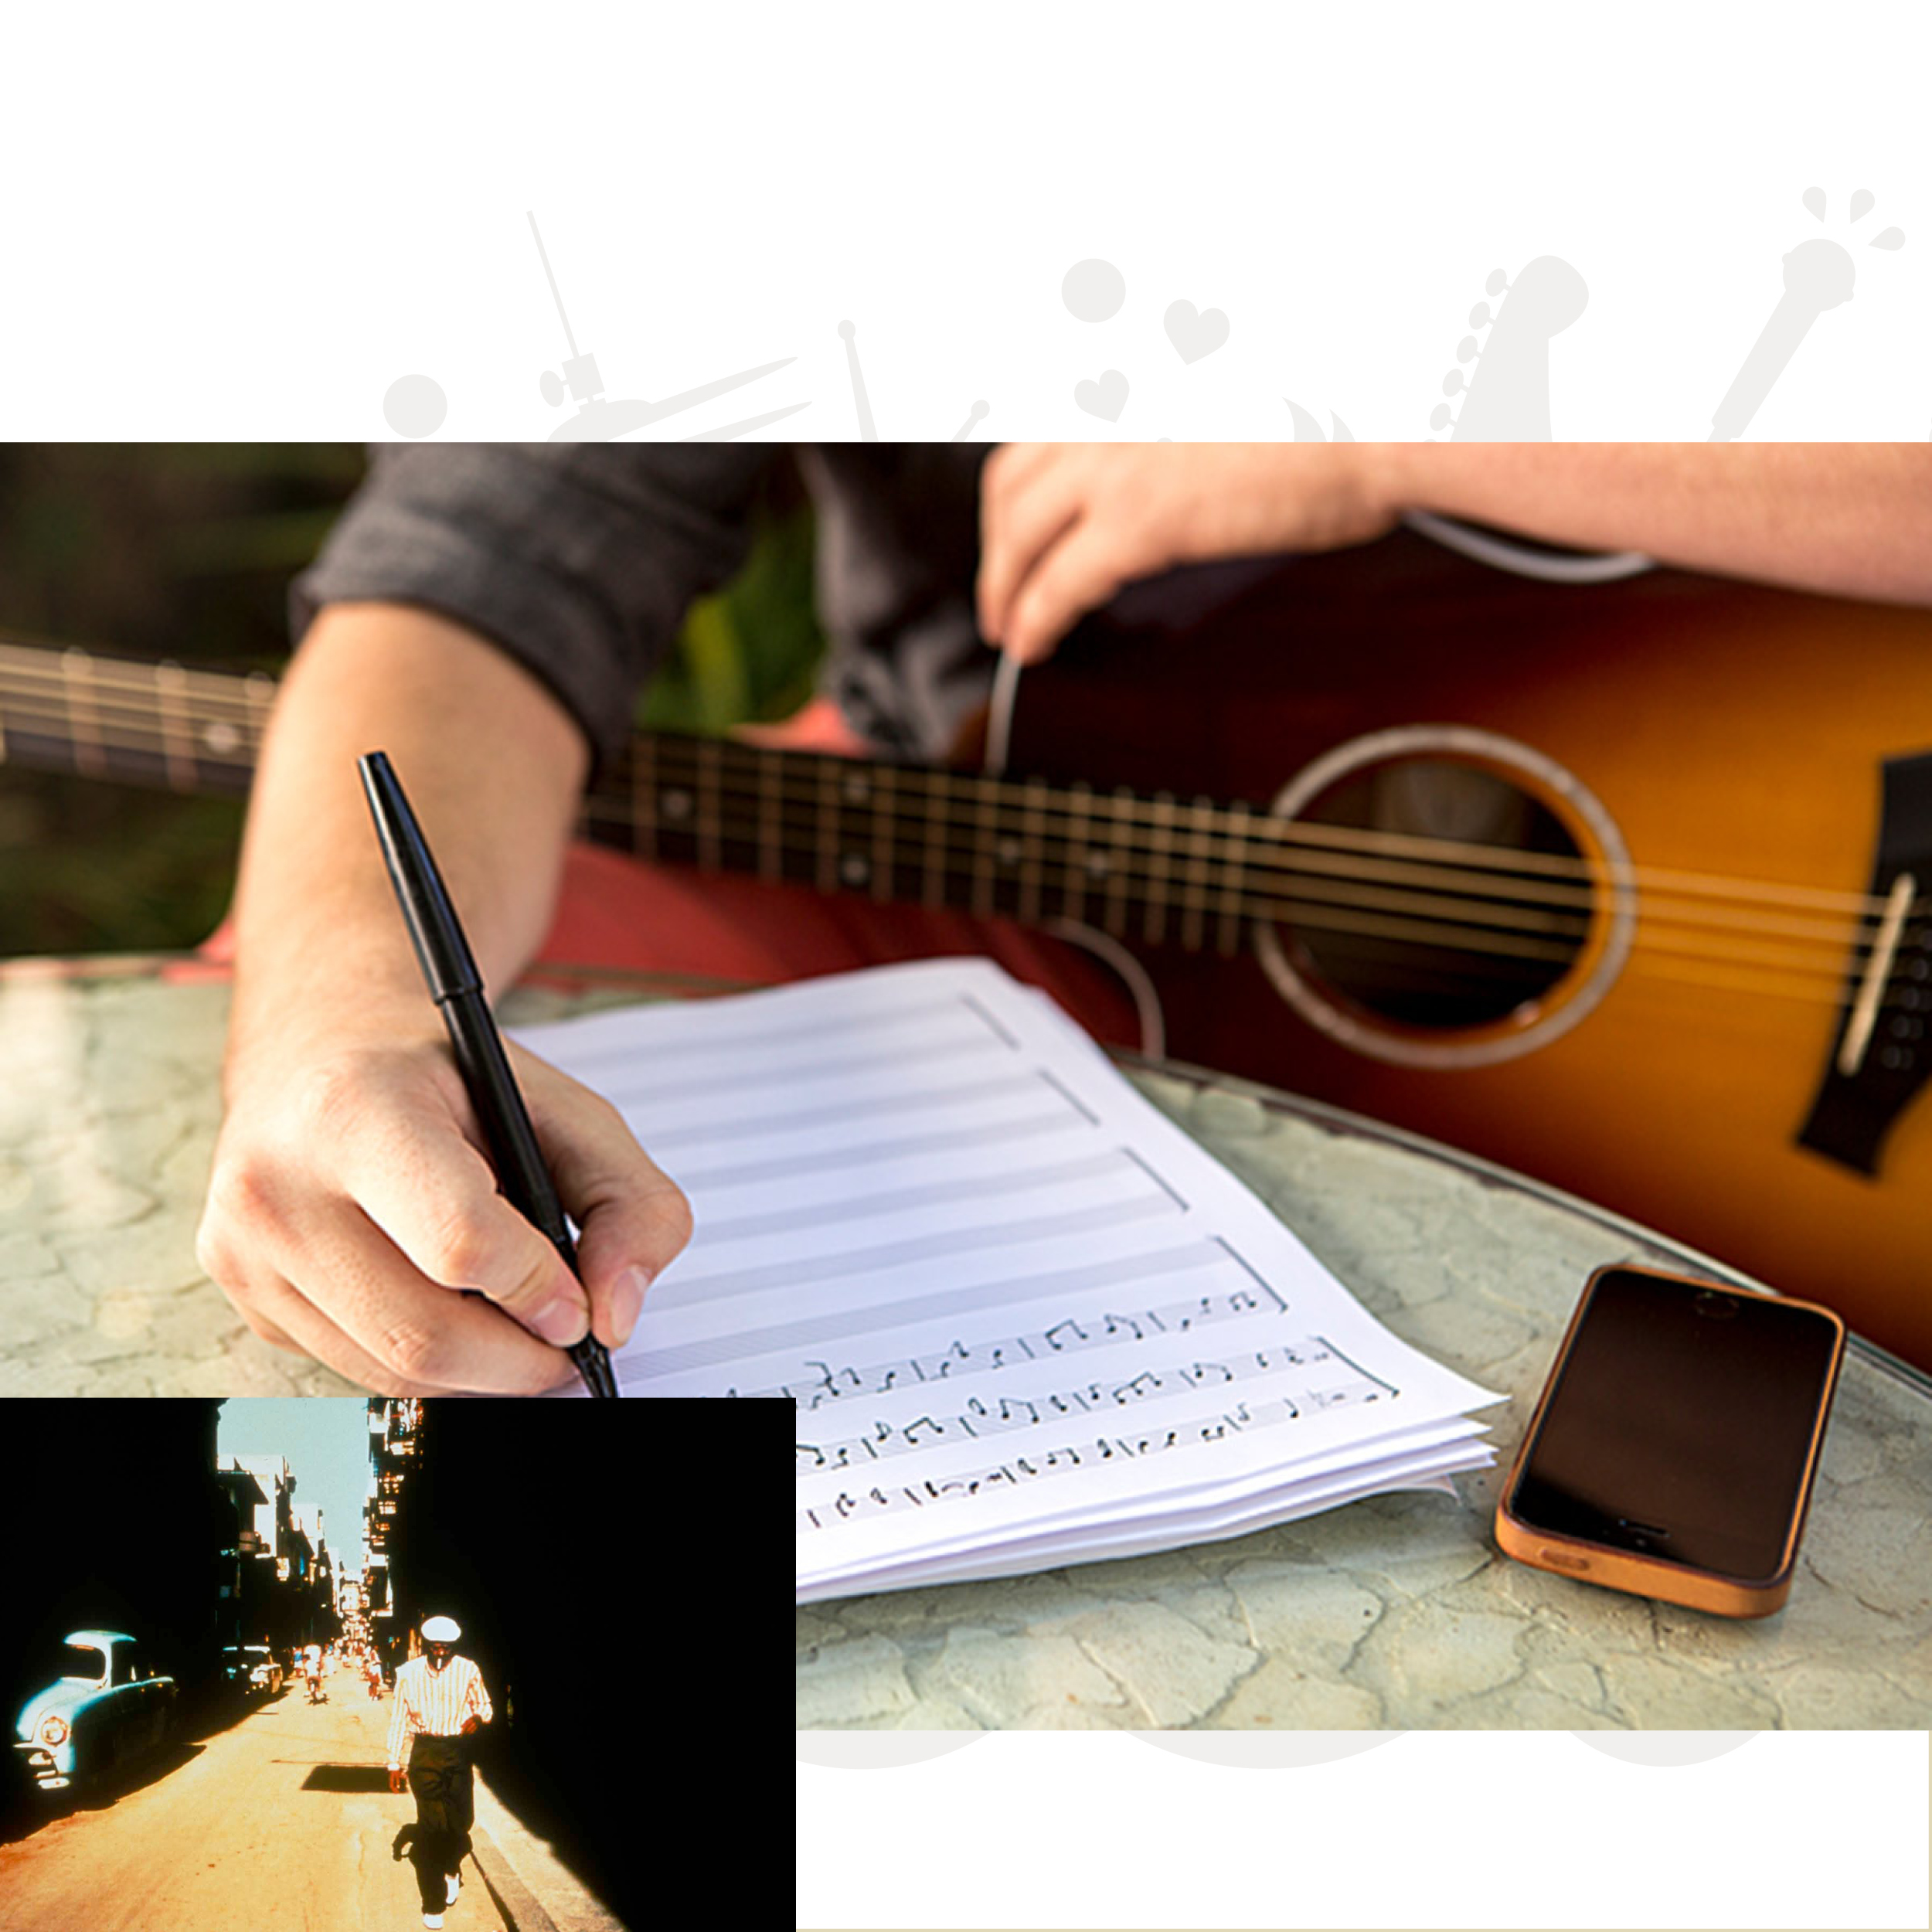 Sangskrivning/komposition/arrangement - cubansk musik